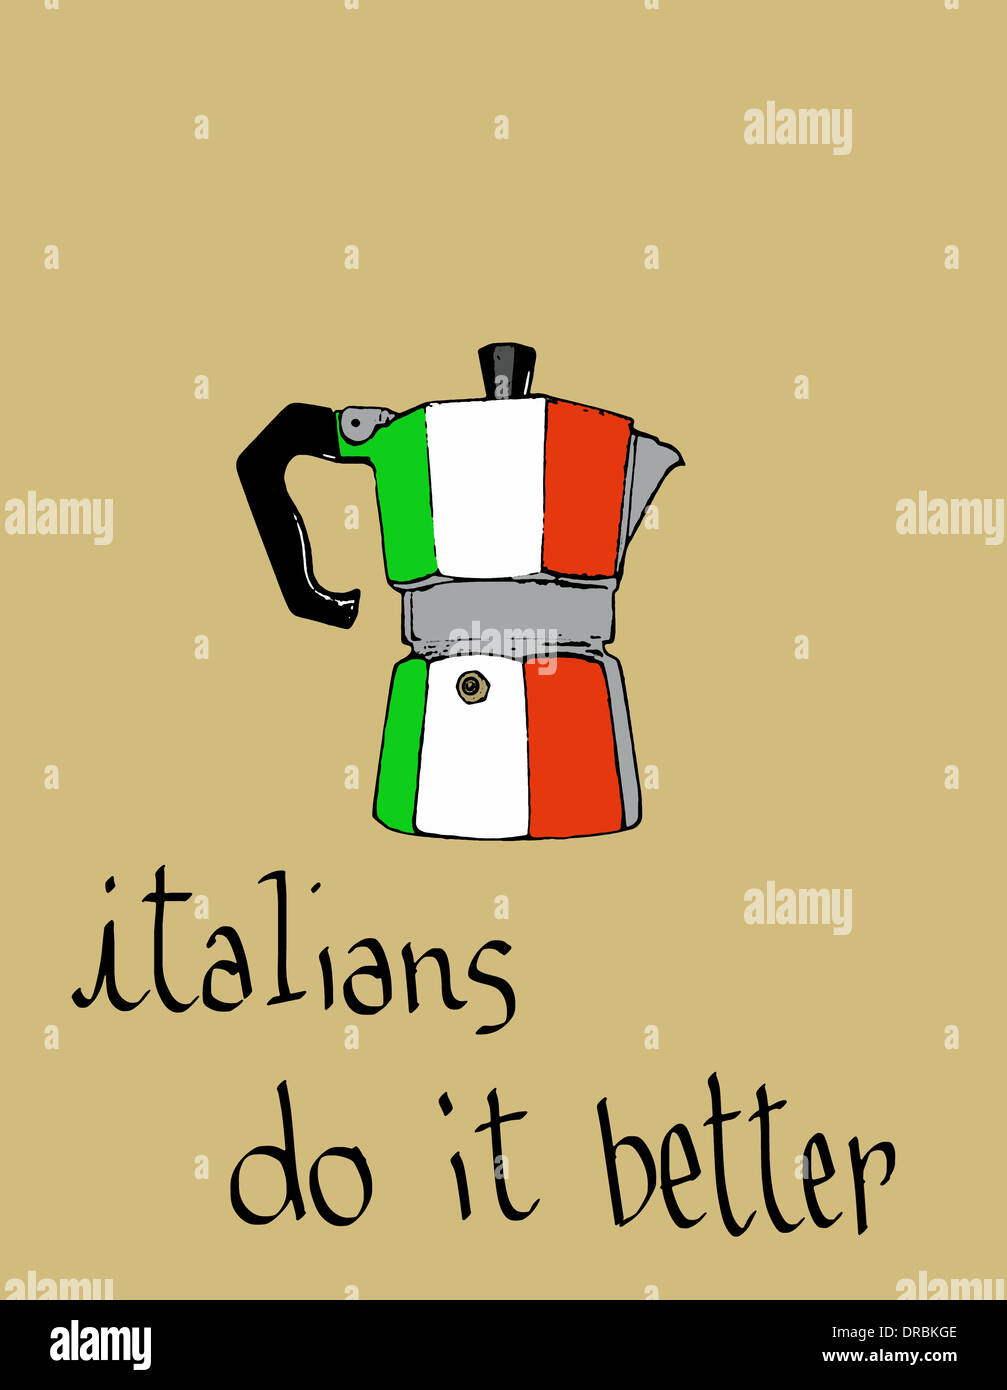 Italian Restaurant Logo With Flag: Italians Do It Better Stock Photo: 66025022